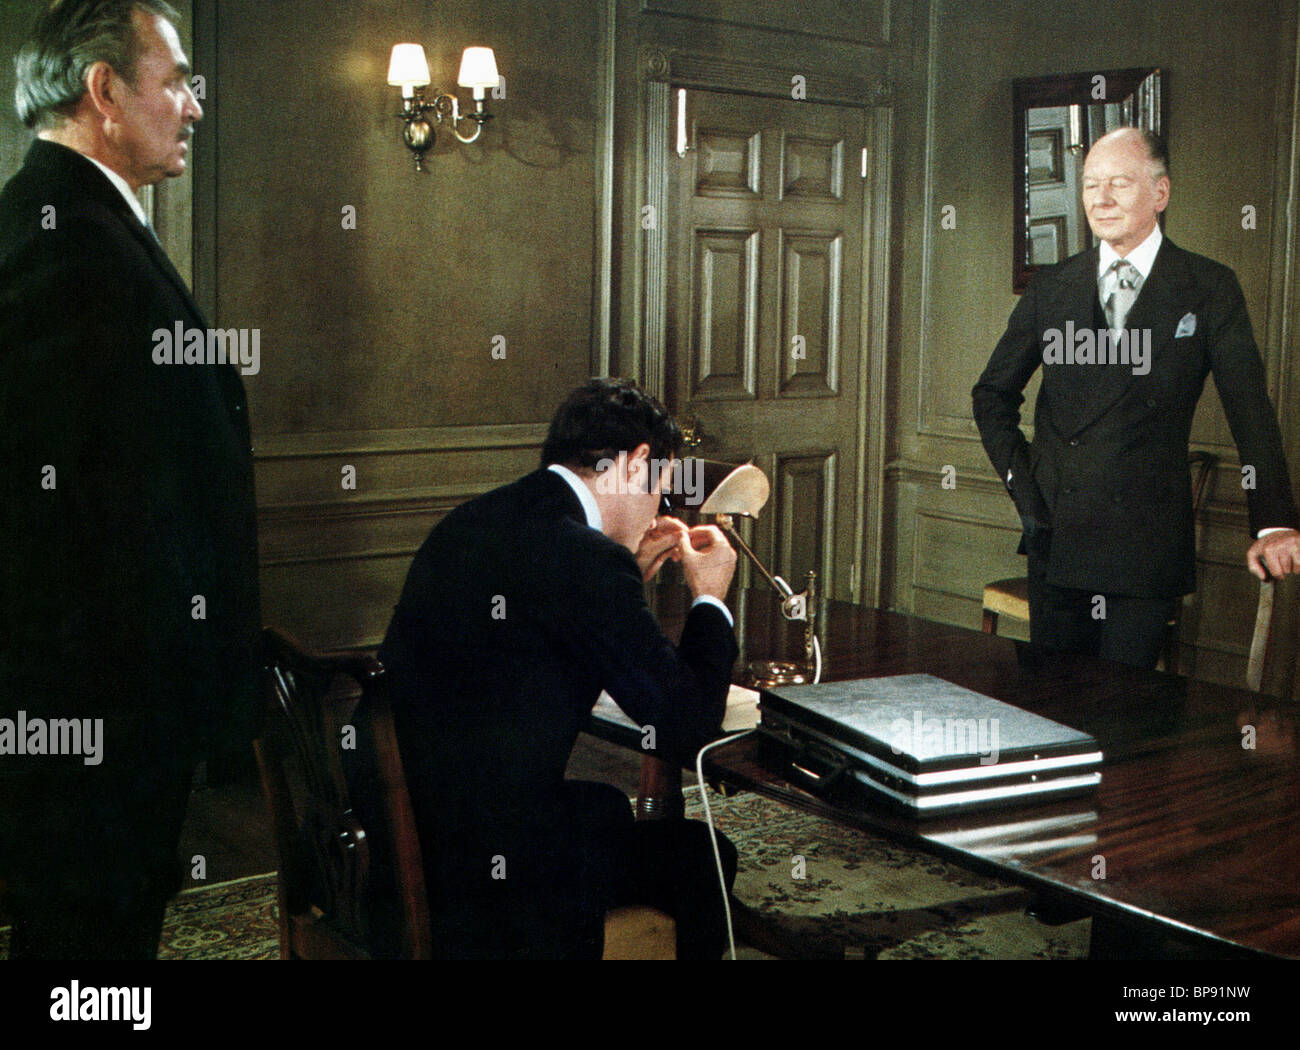 JAMES MASON, CHARLES GRODIN, JOHN GIELGUD, 11 HARROWHOUSE, 1974 - Stock Image